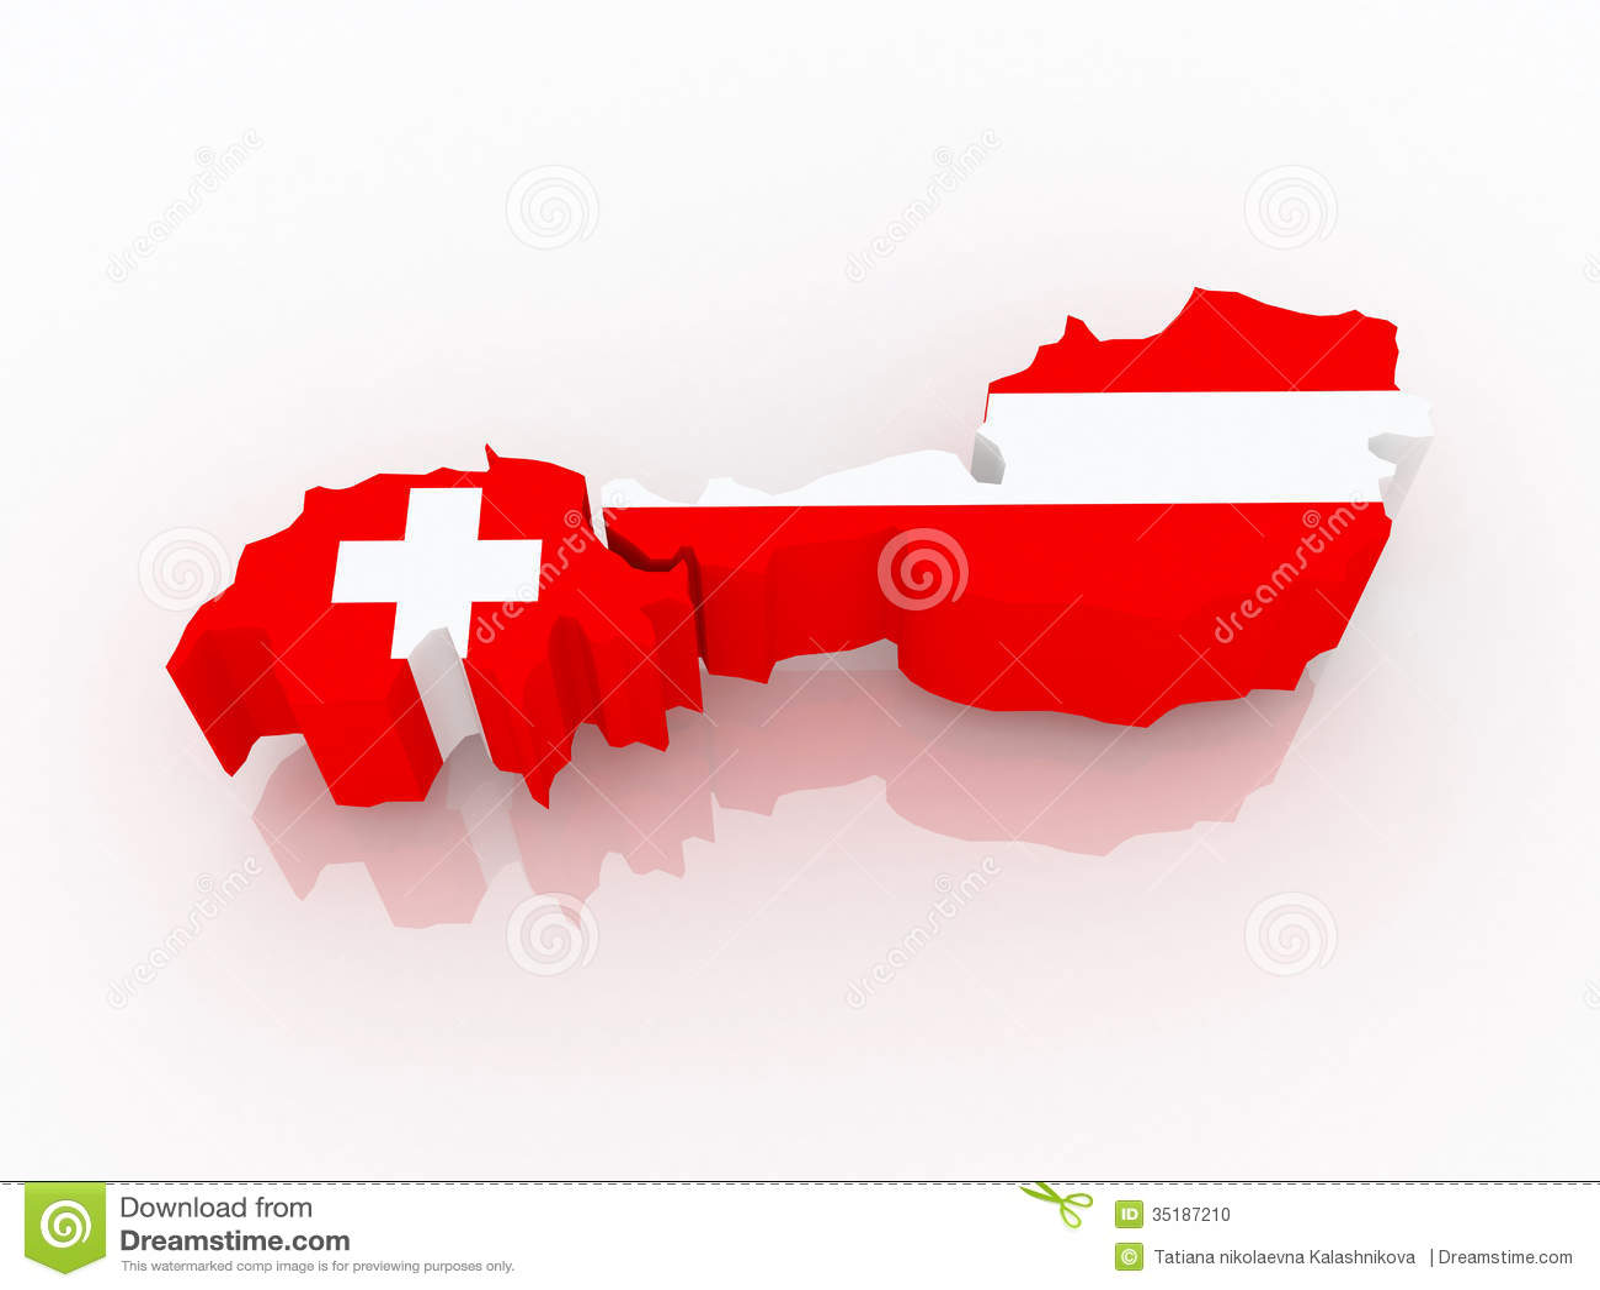 Map Of Switzerland And Austria. Stock Illustration - Illustration of ...